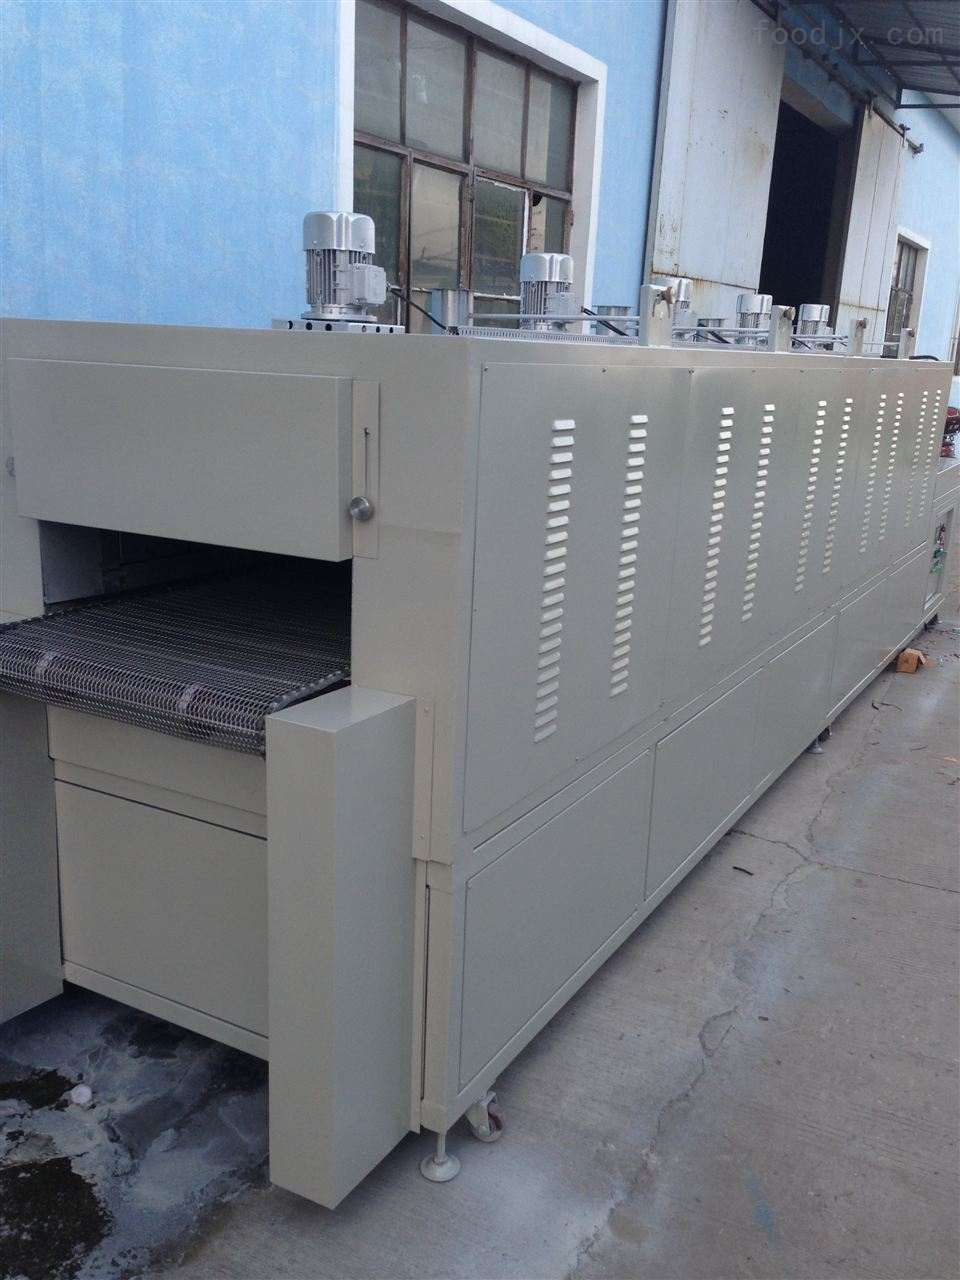 TY-65多功能干燥设备远红外隧道式烘干炉热缩炉